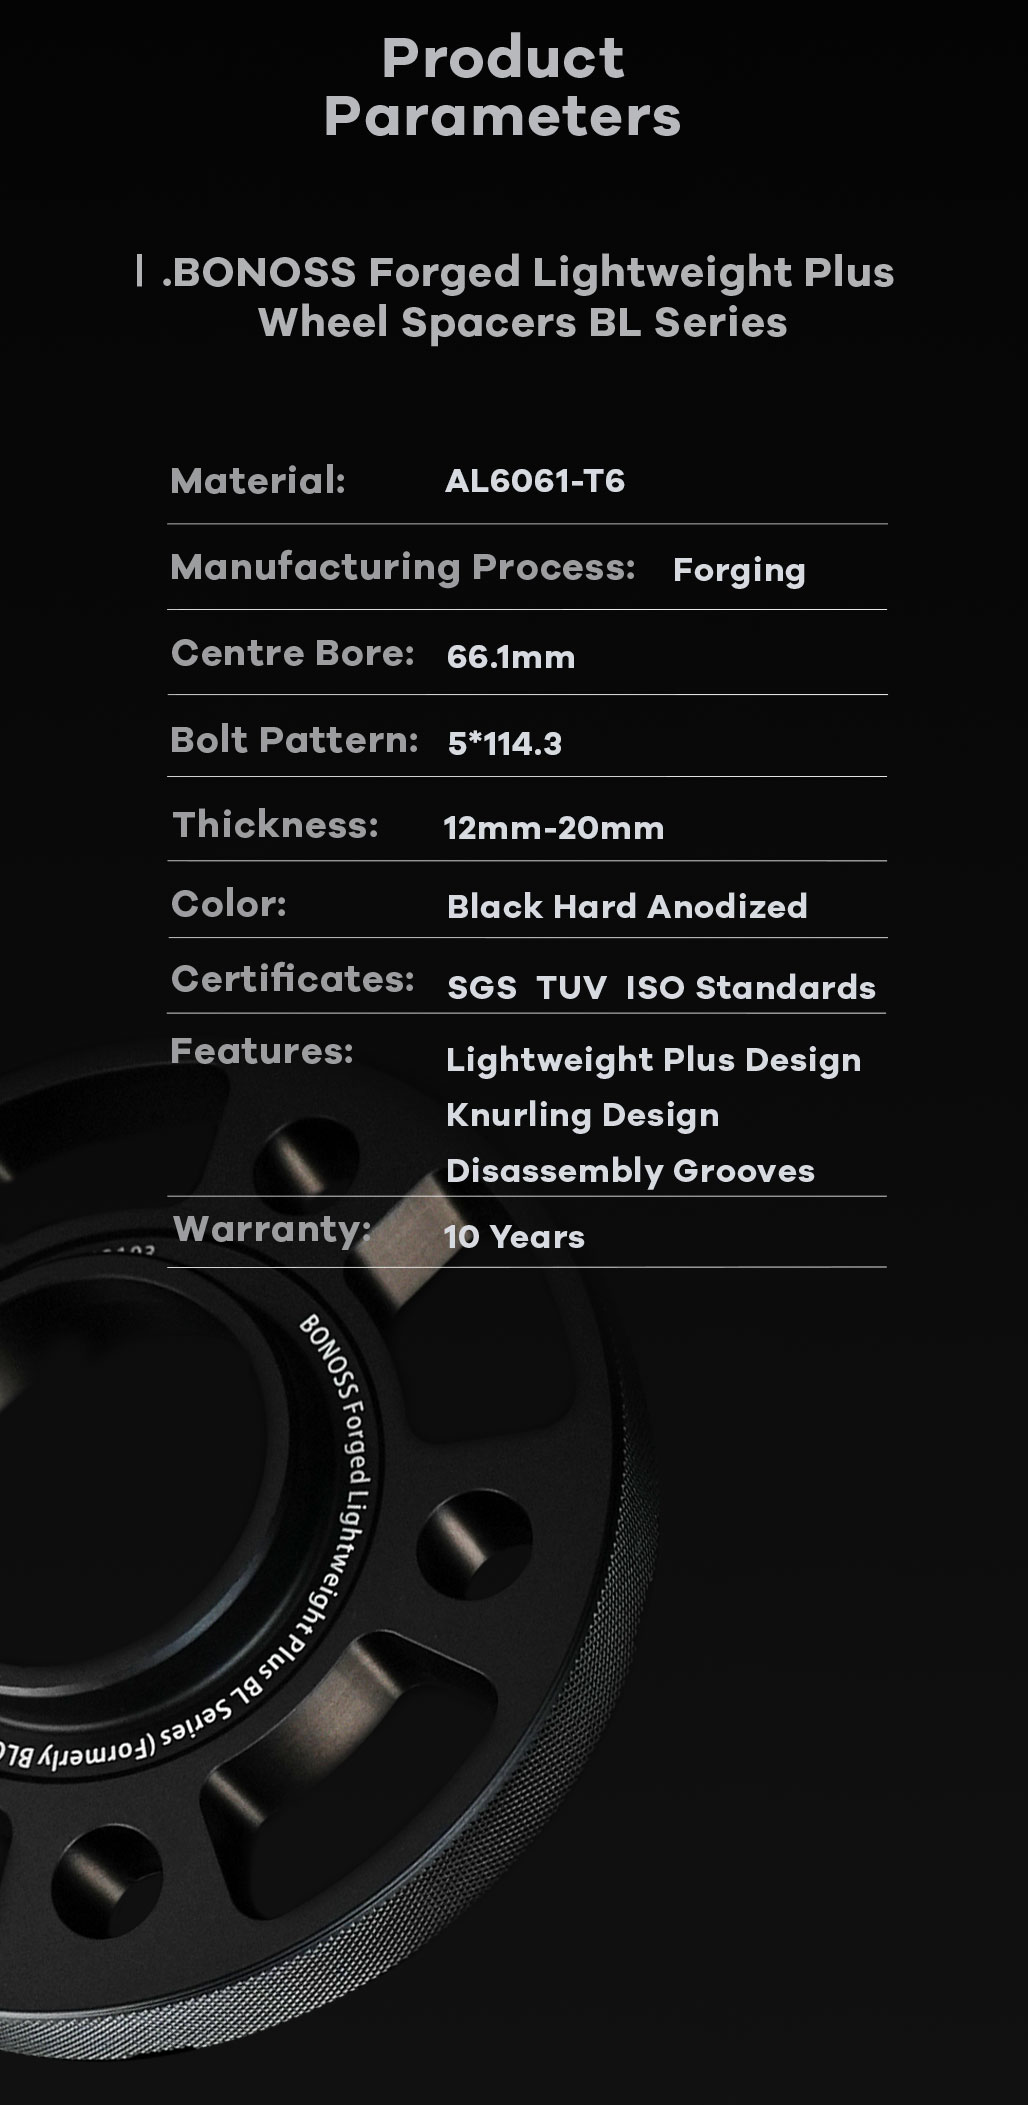 BONOSS-forged-lightweight-plus-wheel-spacer-Opel-Vivaro-B-5x114.3-66.1-M14x1.5-6061T6-by-grace-1